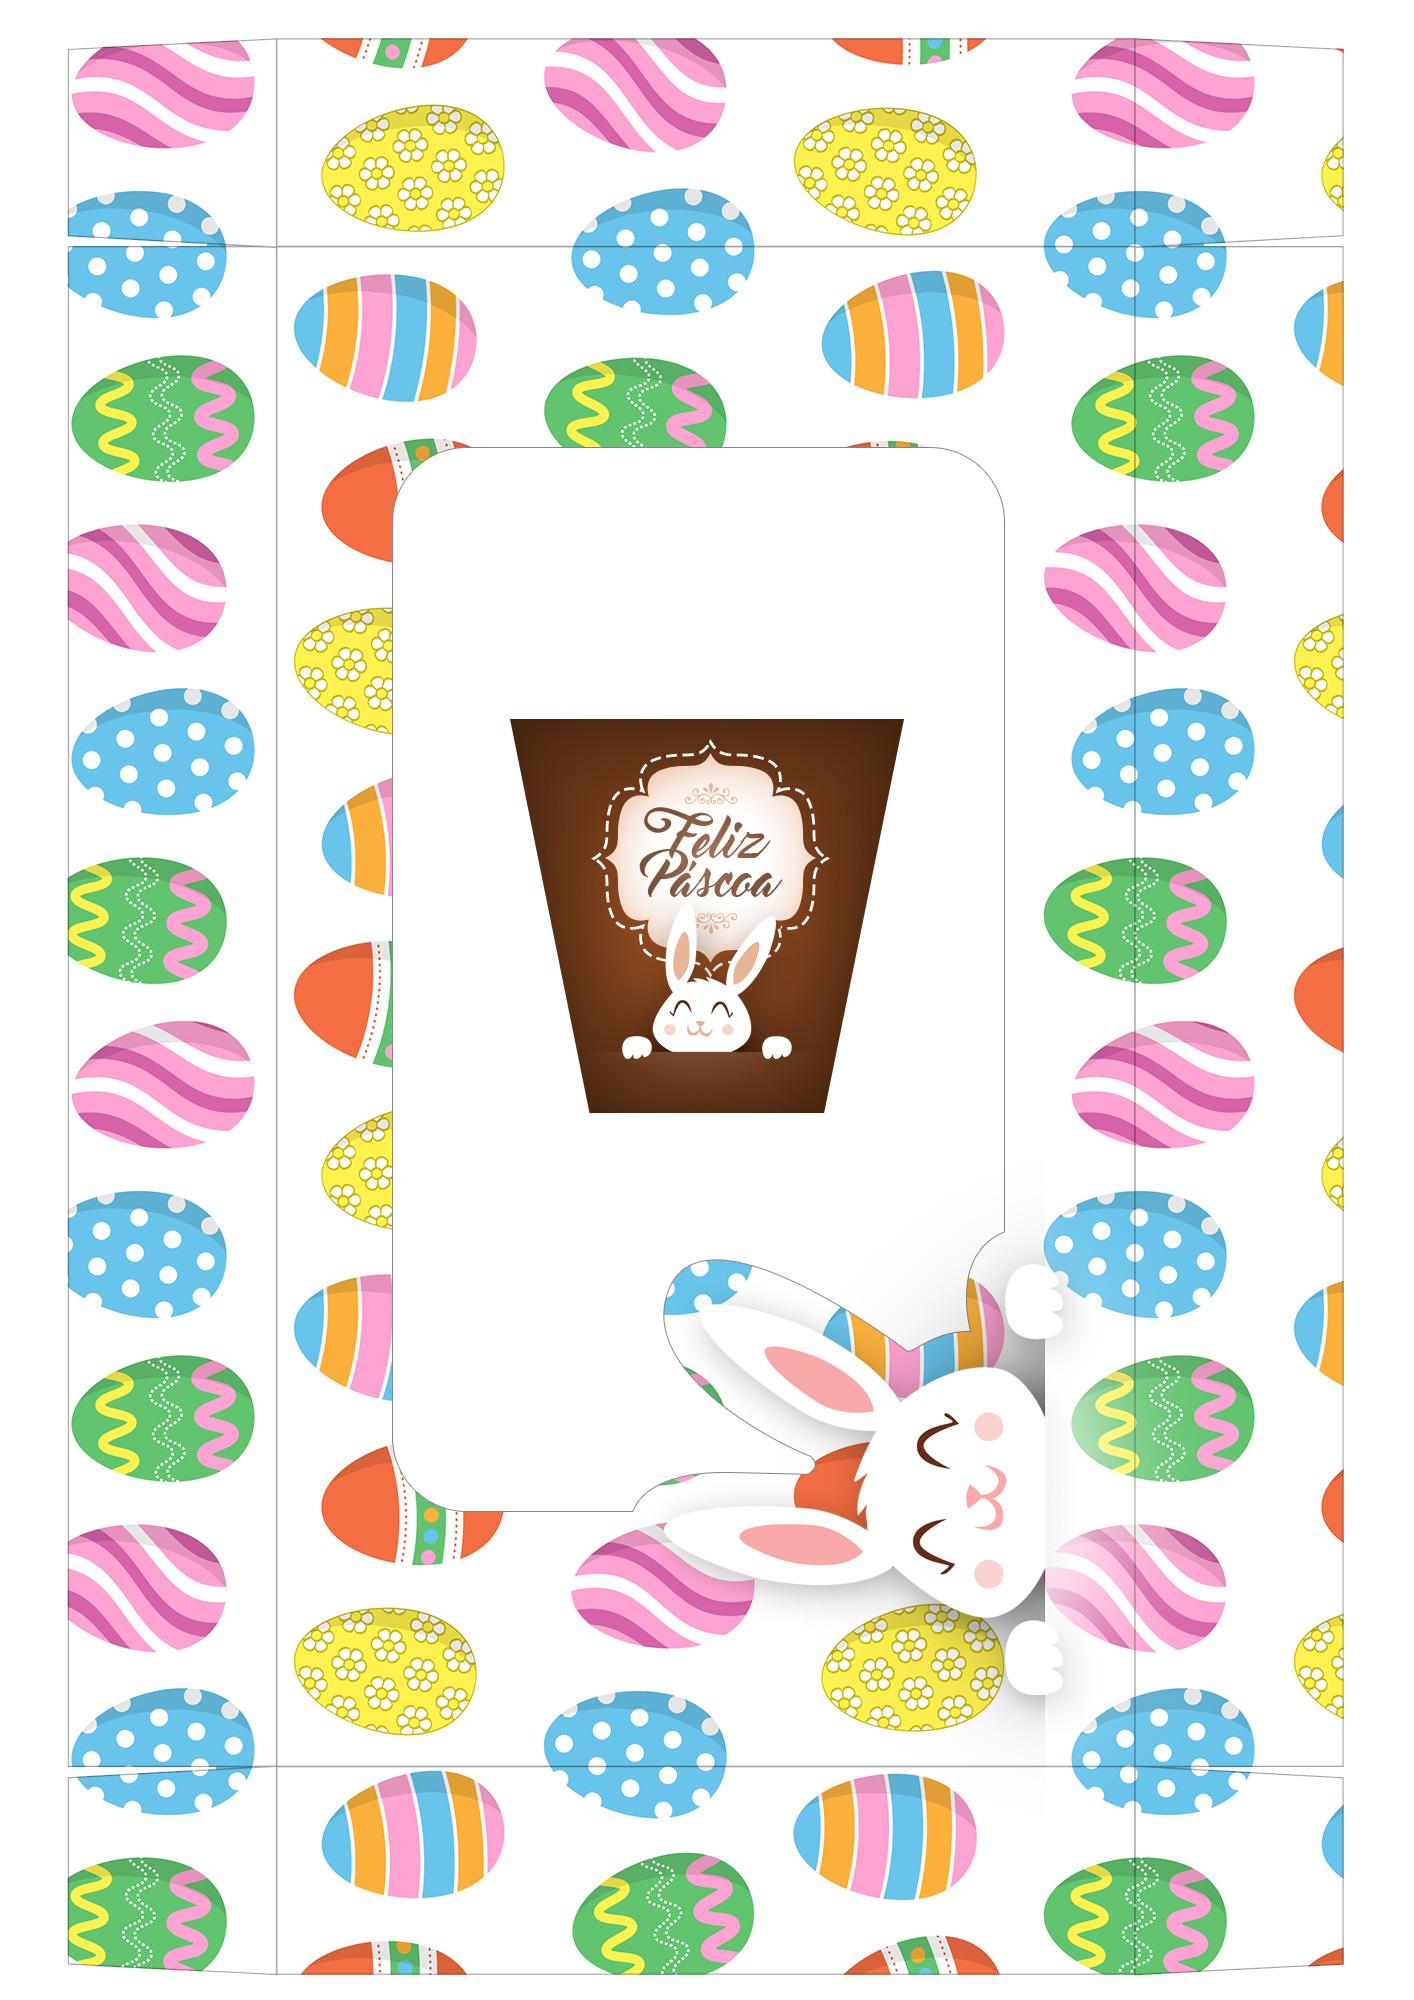 Caixa Kit Mini Confeiteiro para Páscoa 9 - parte de cima